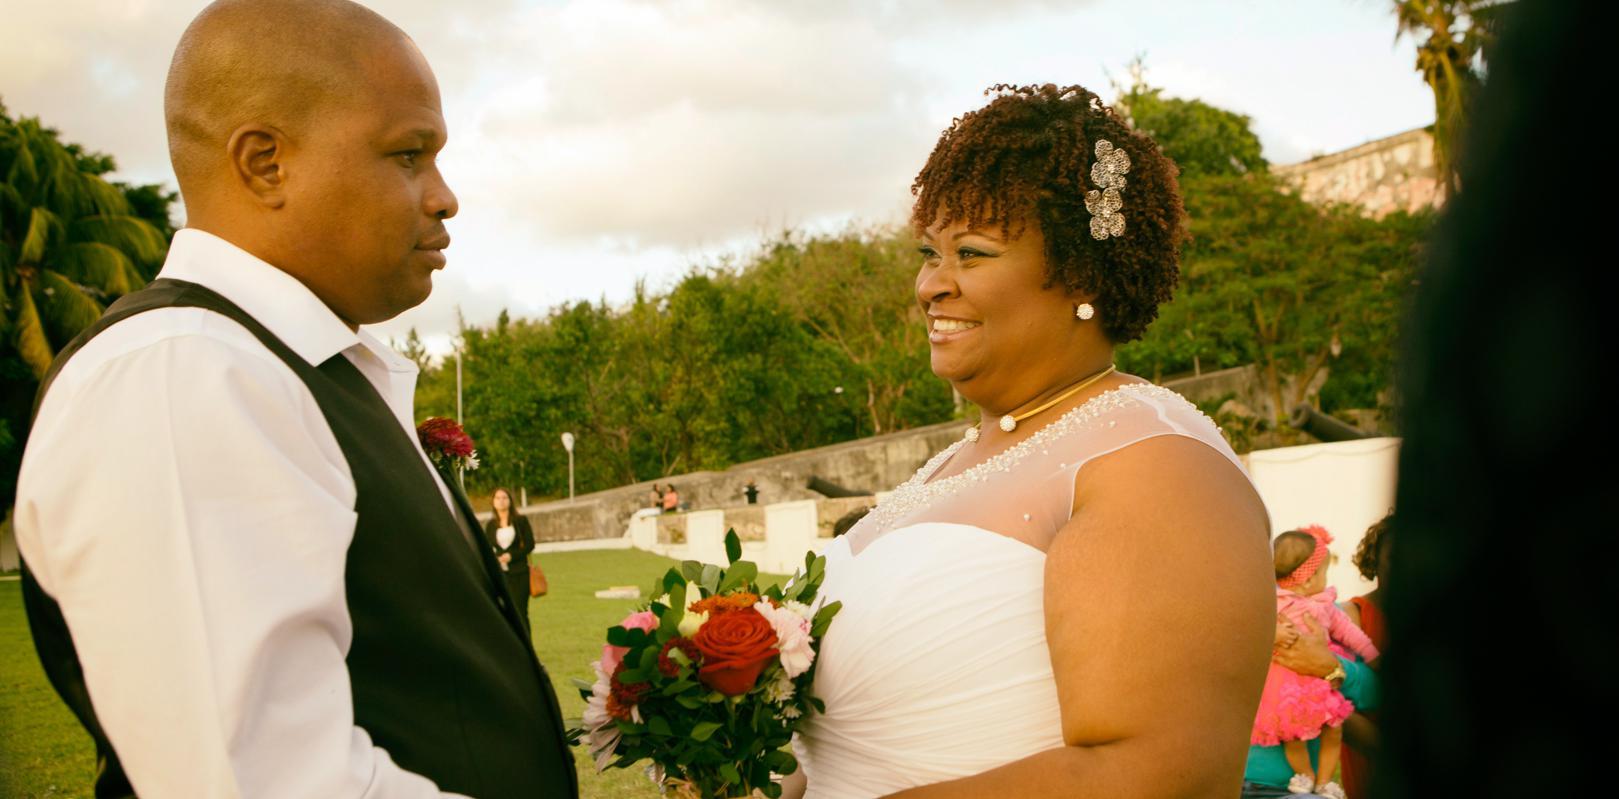 bodas-sin-clasificar-sin-tema-cuba-42102.jpg